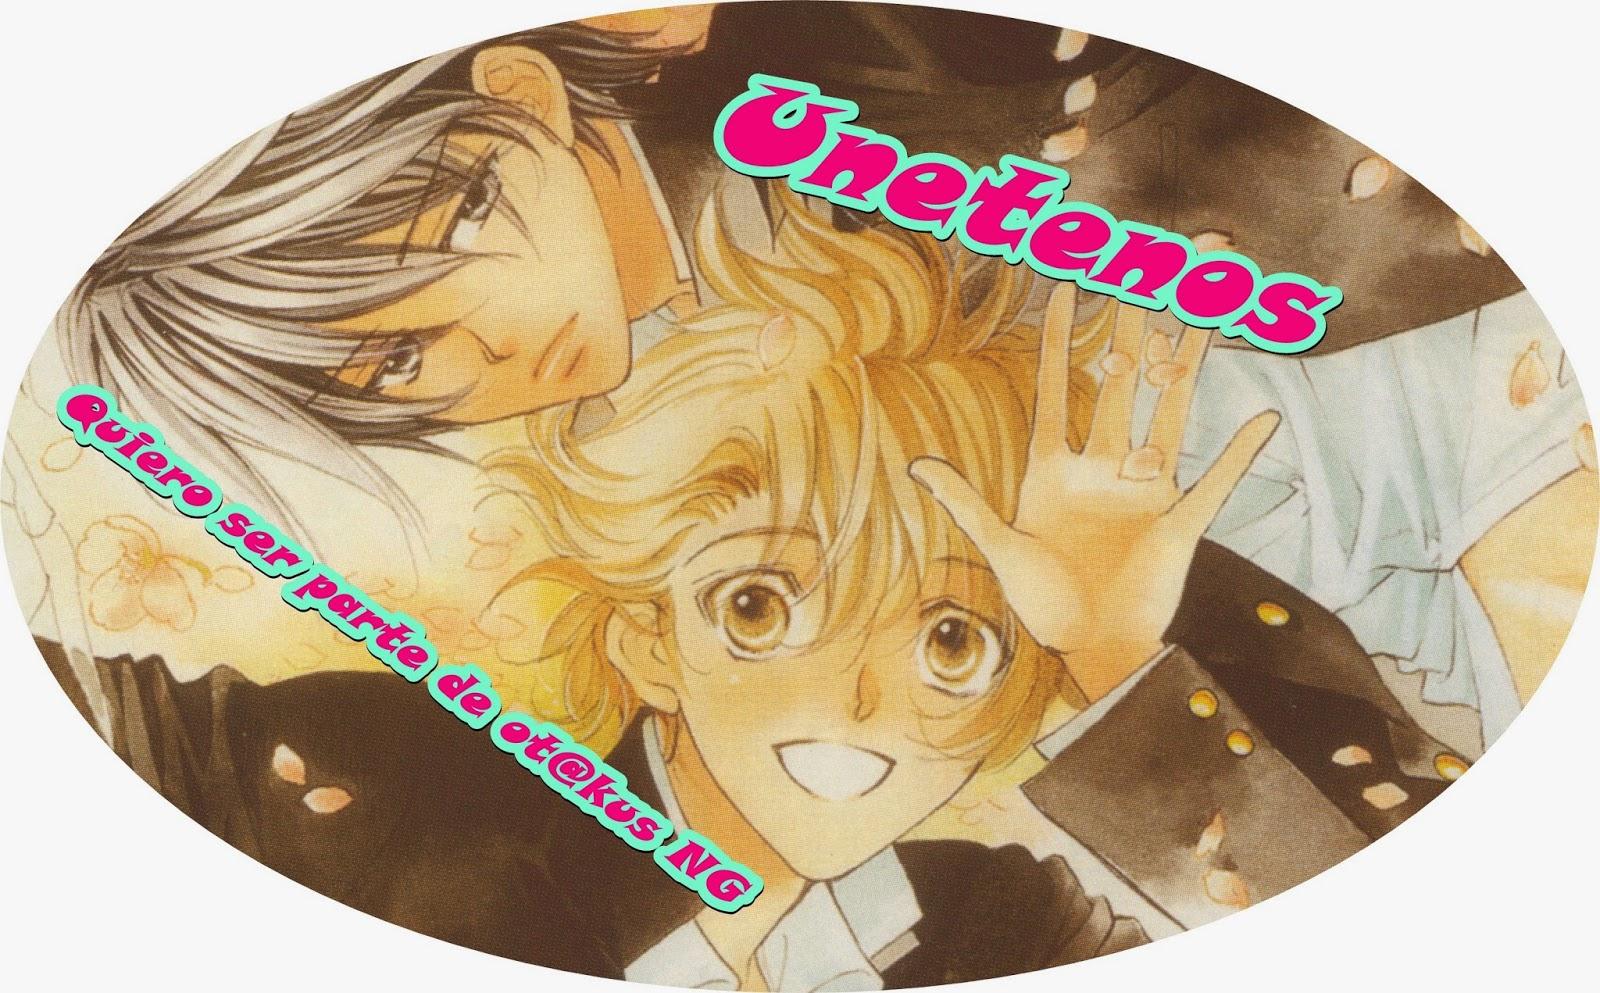 http://otakusafull.wix.com/foro-fans-otakus#!unetenos/c20w9